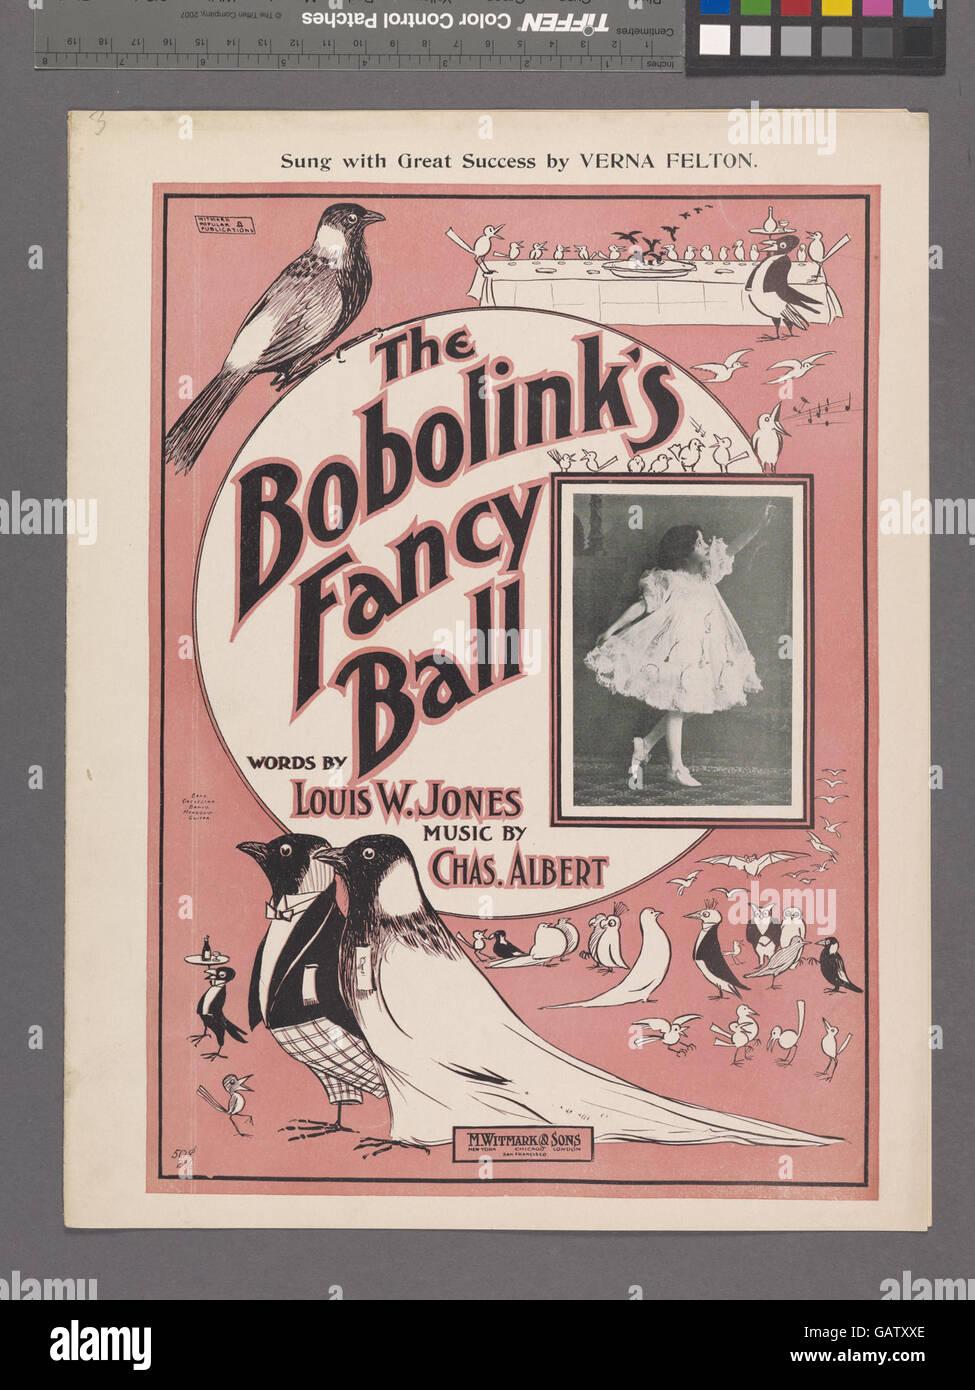 The bobolinks fancy ball ( Hades-1924973-1953238) - Stock Image